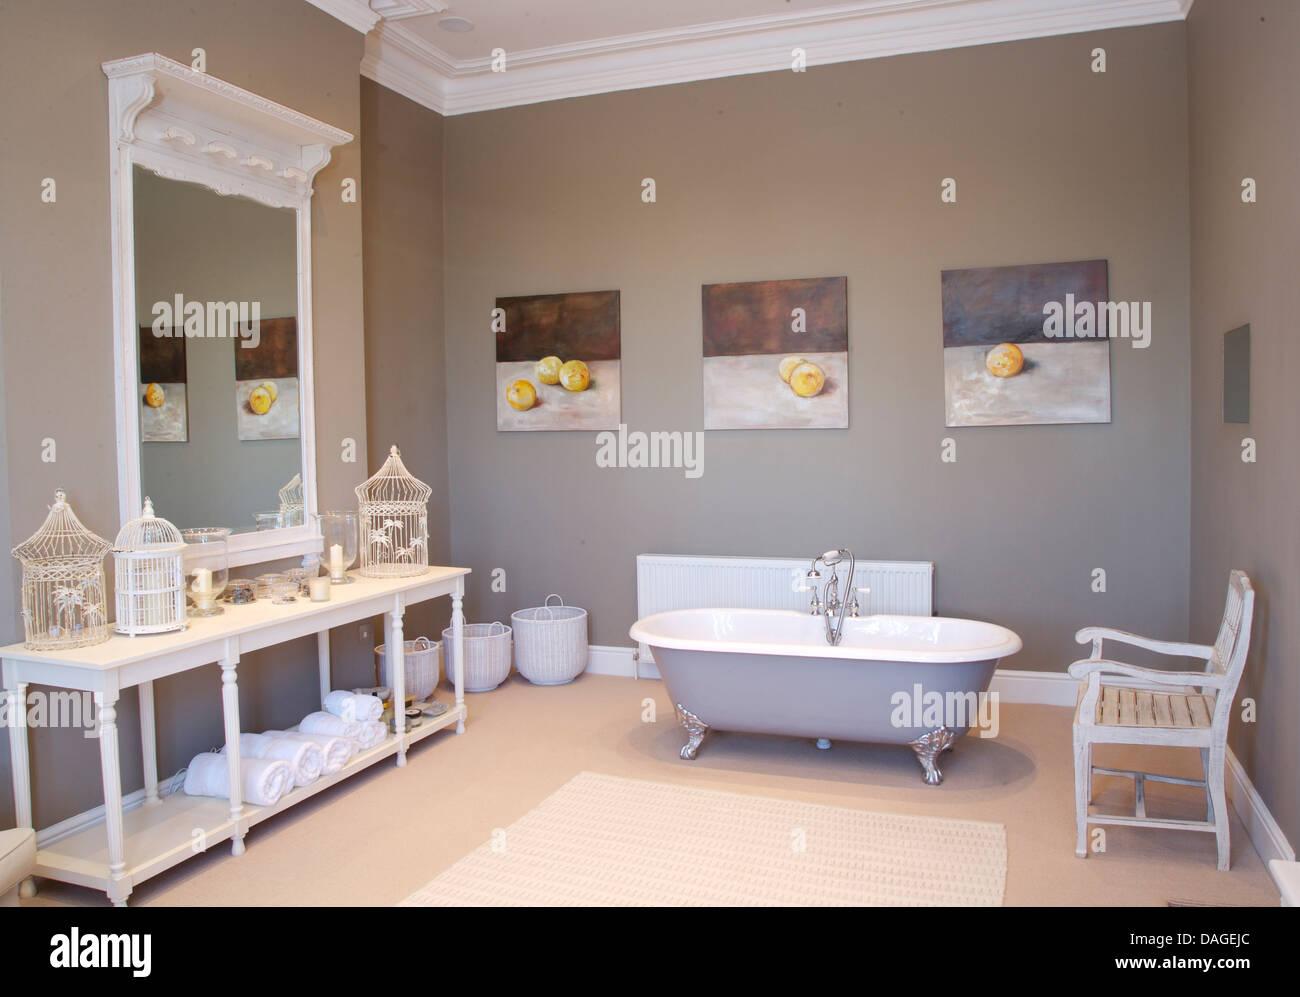 Angel Bathroom Decor